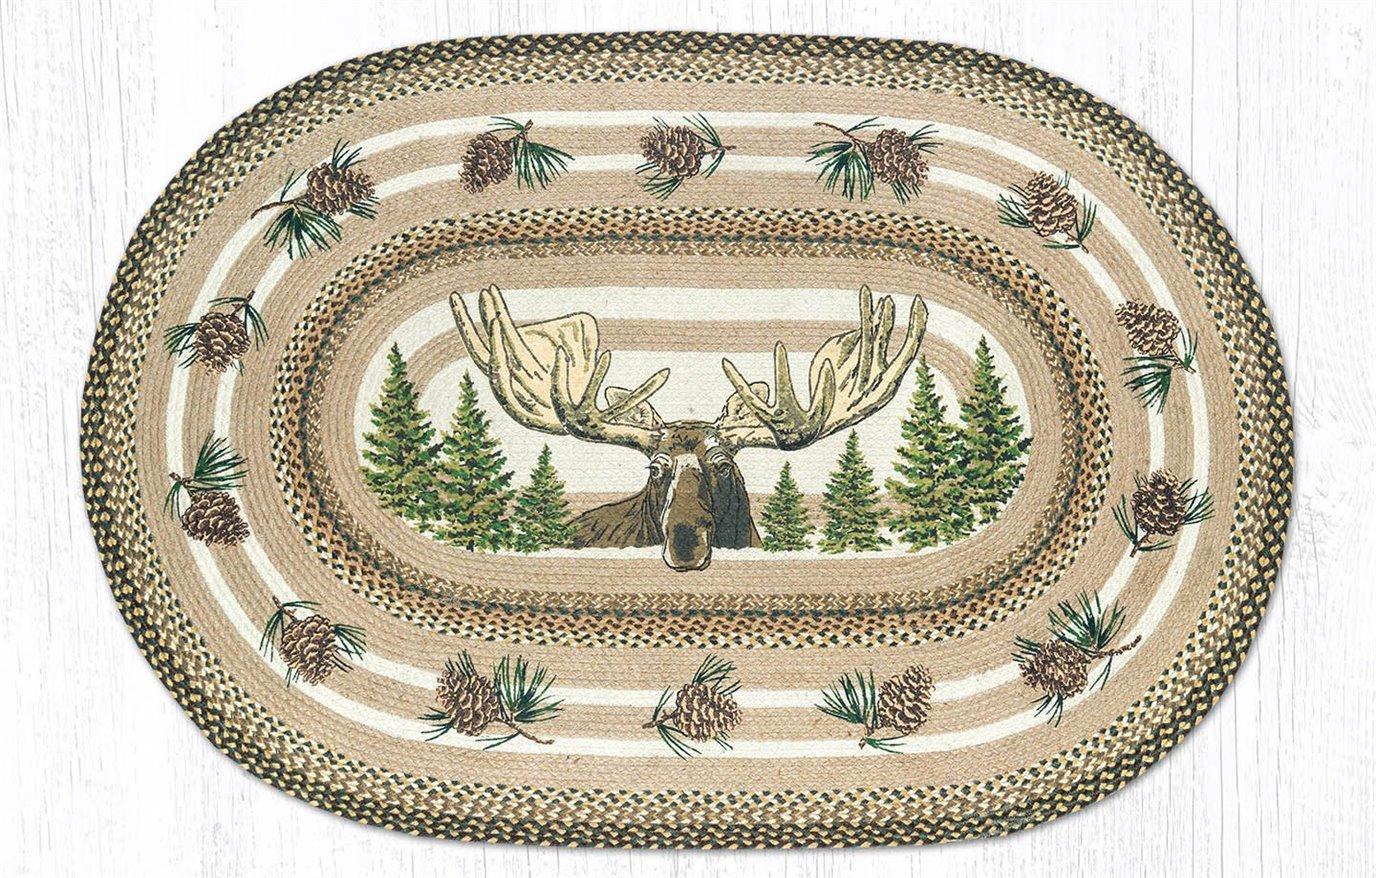 Bull Moose Oval Braided Rug 4'x6'